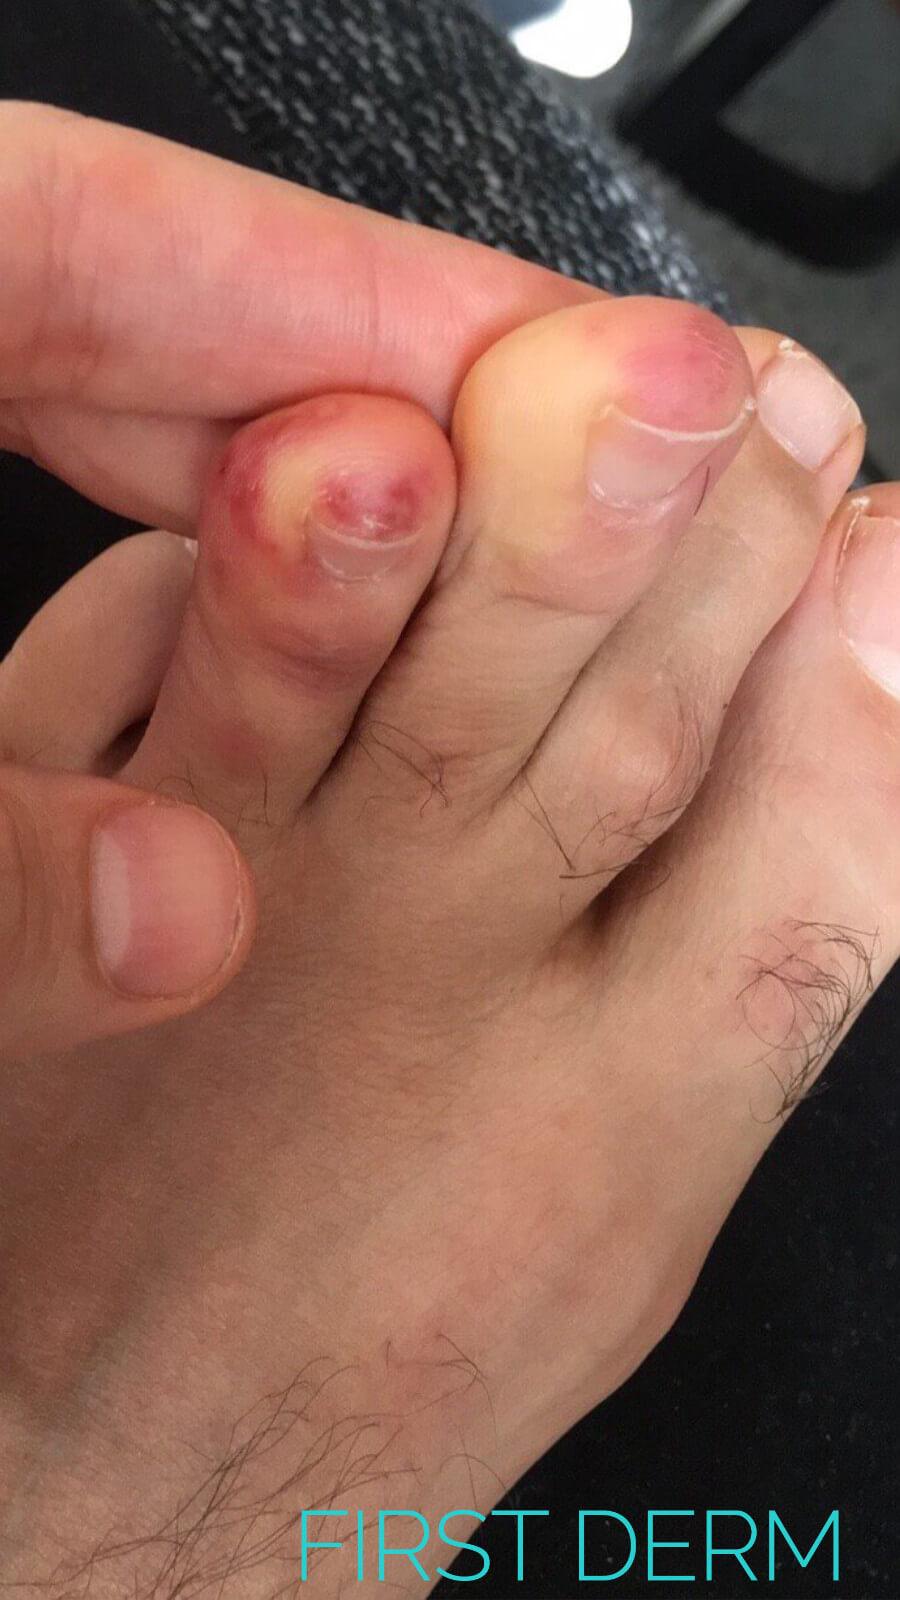 Coronavirus (Covid-19) Skin: Covid Toes